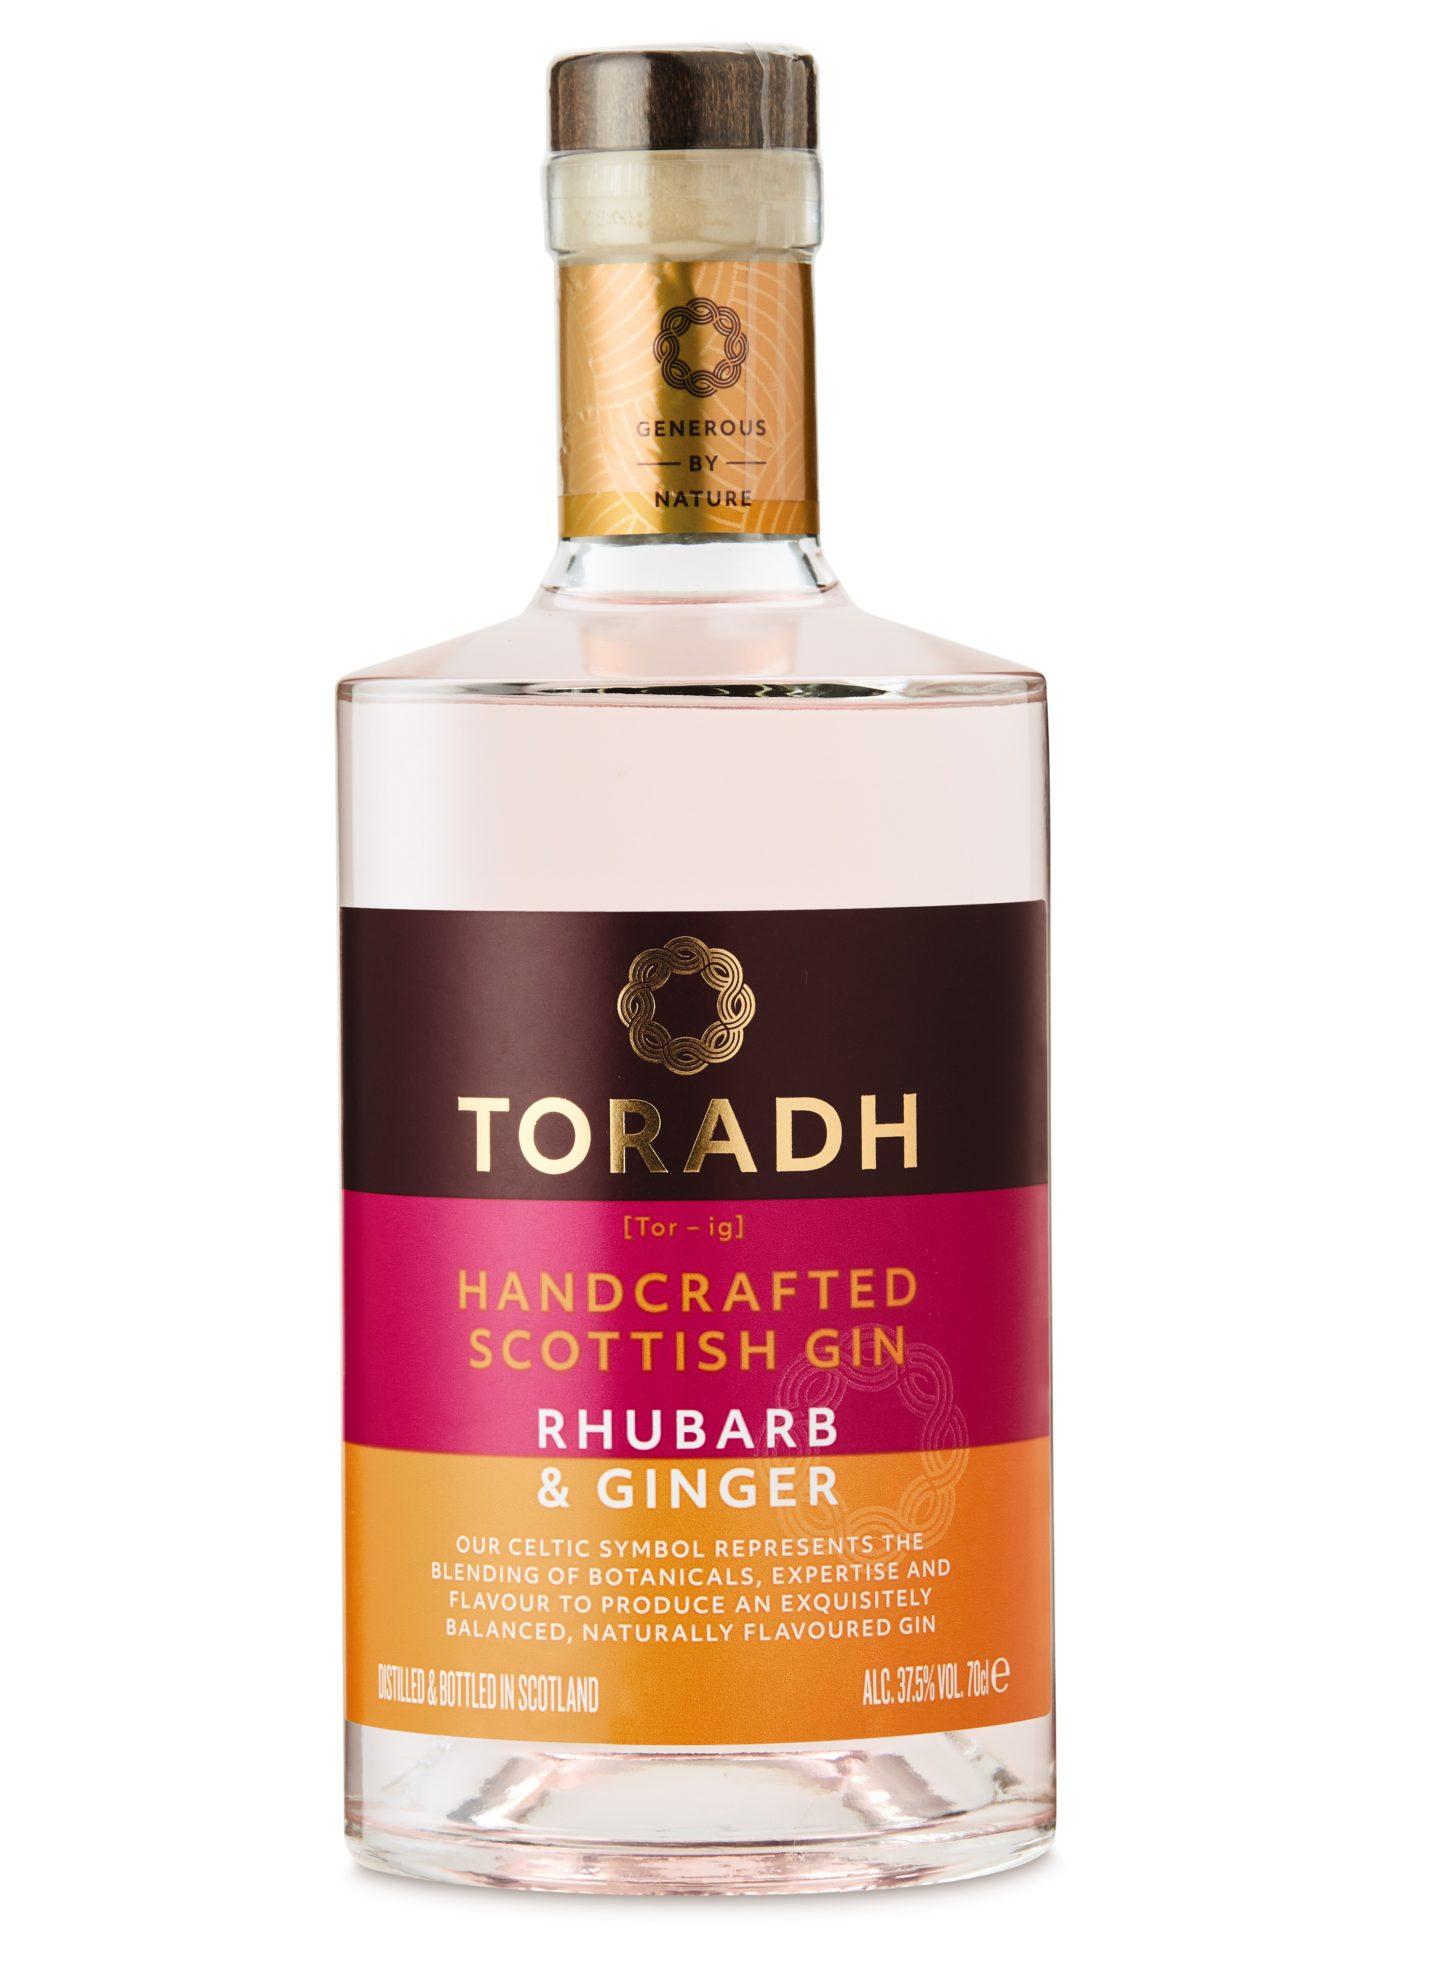 Toradh Rhubarb and Ginger Gin